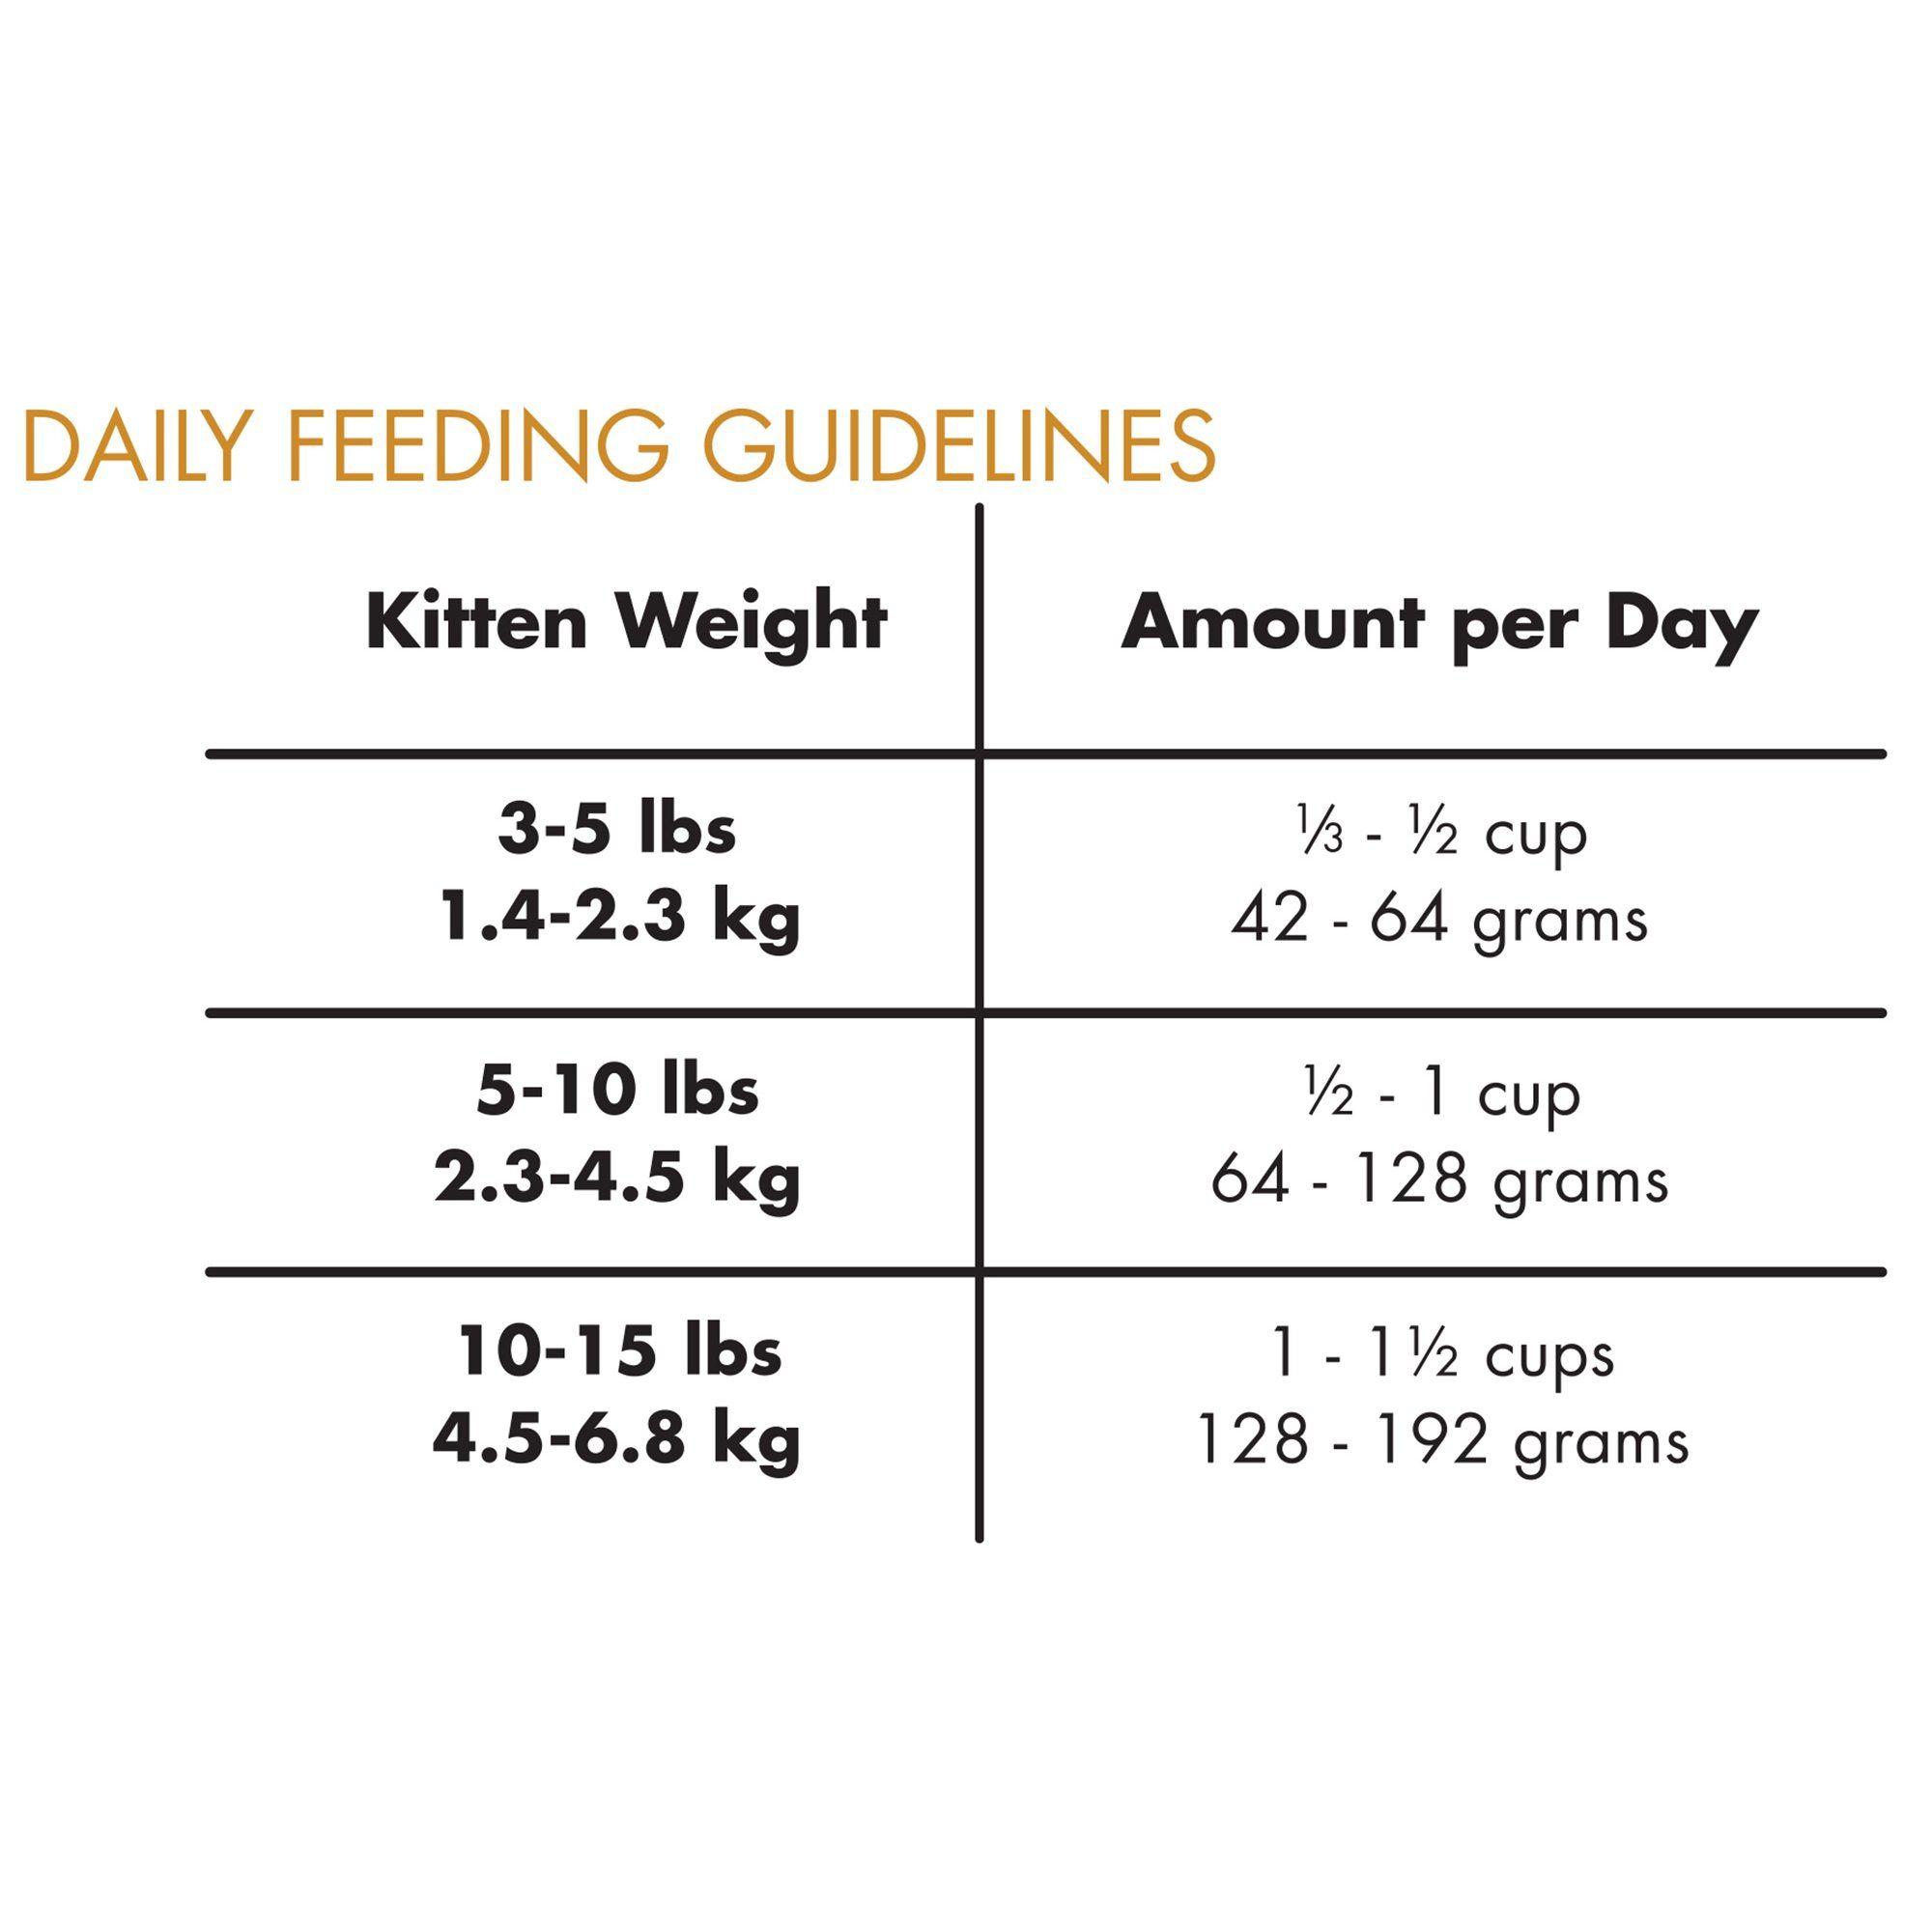 Canidae Grain Free Pure Foundations Kitten Formula Made With Chicken 2 5 Lbs Kitten Formula Grain Free Kitten Food